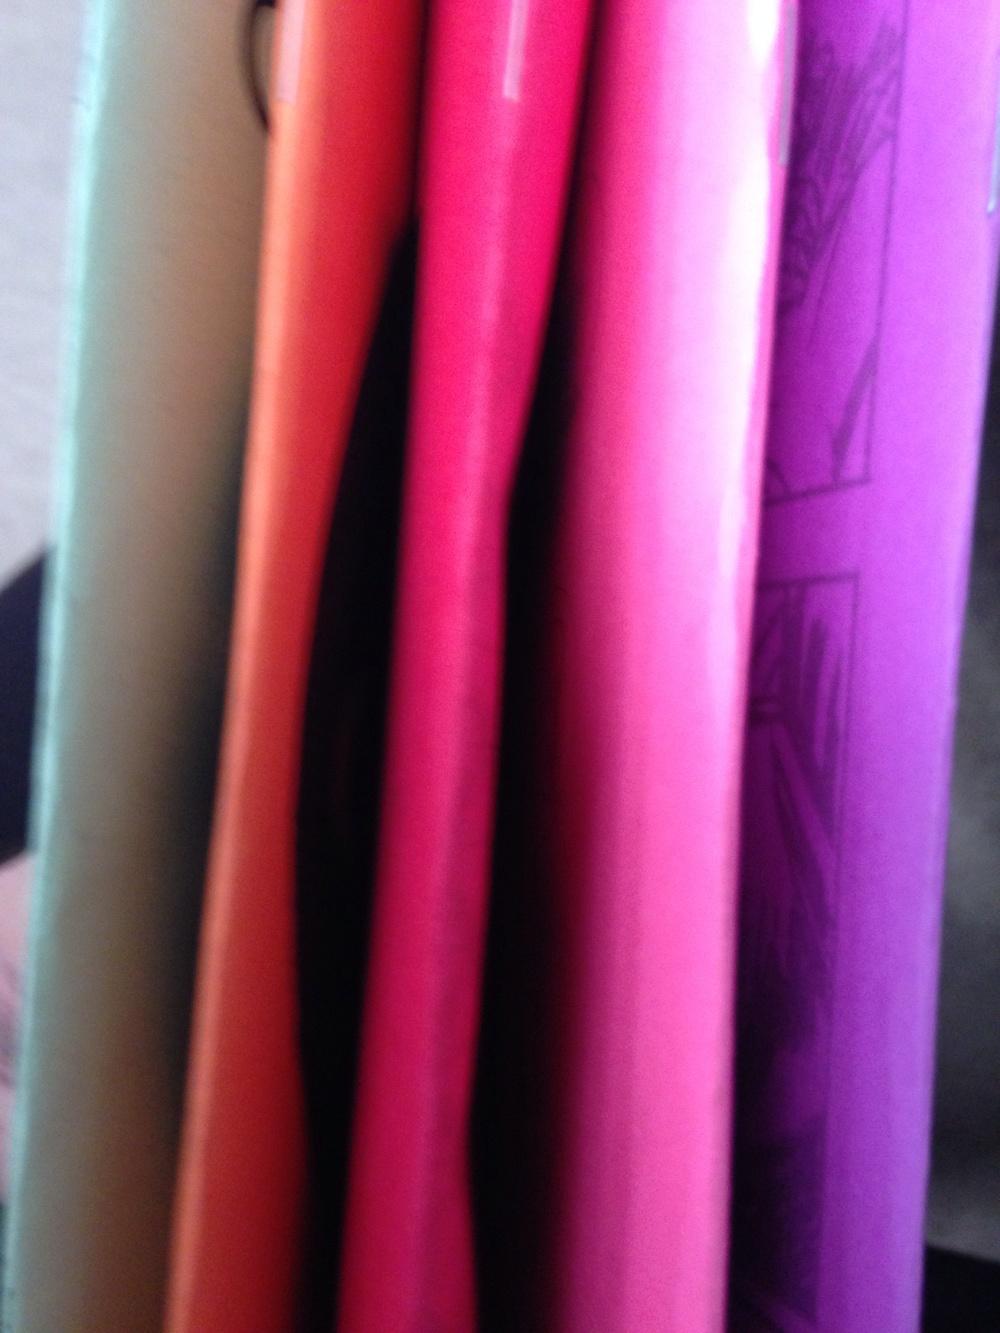 lookit dems dere colors amirite